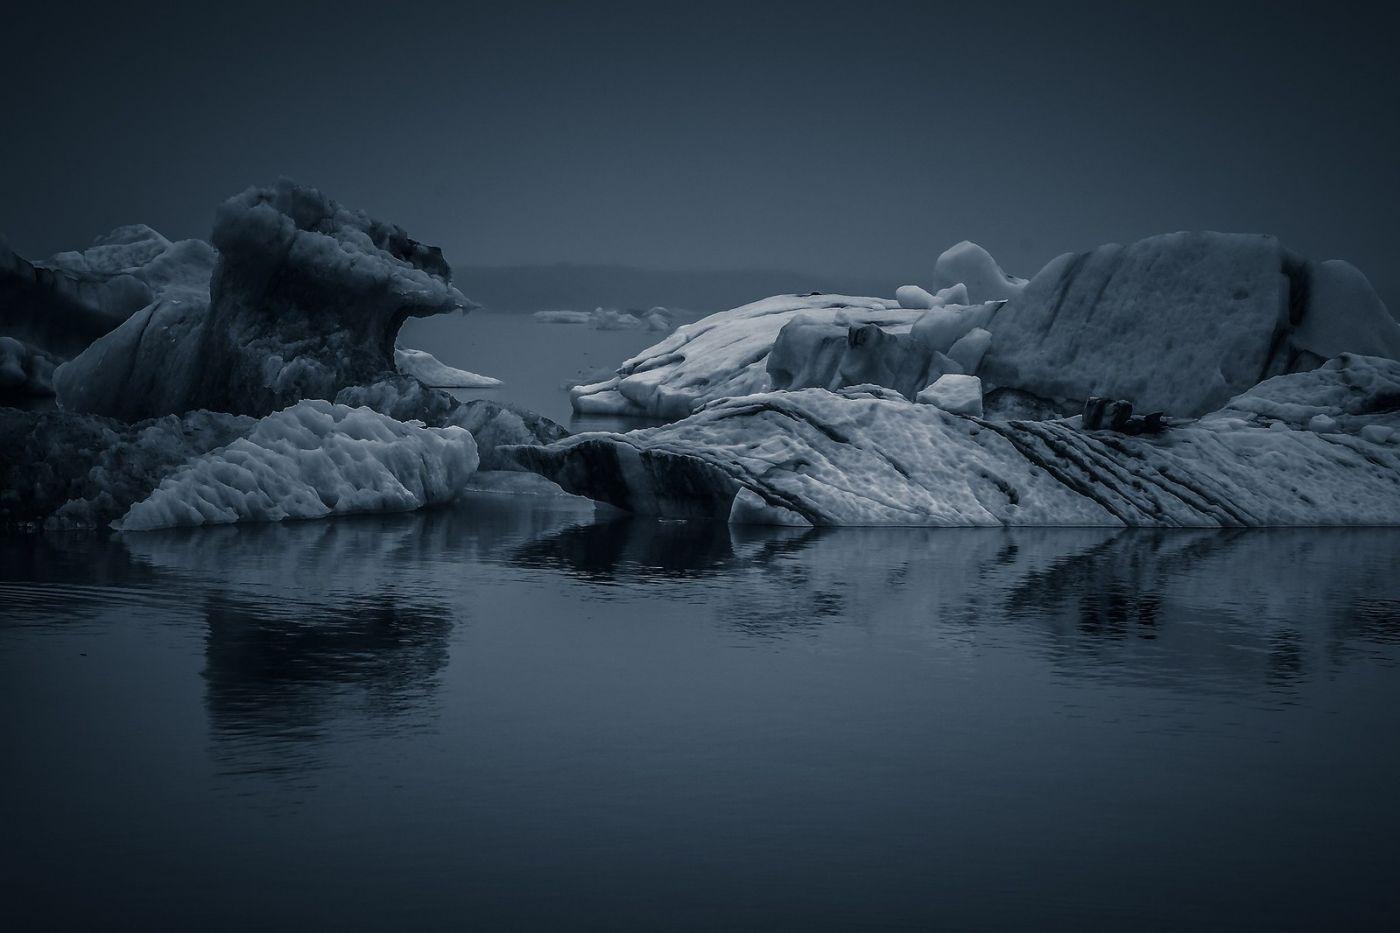 冰岛冰川泻湖(Glacier Lagoon),流动的冰川_图1-26